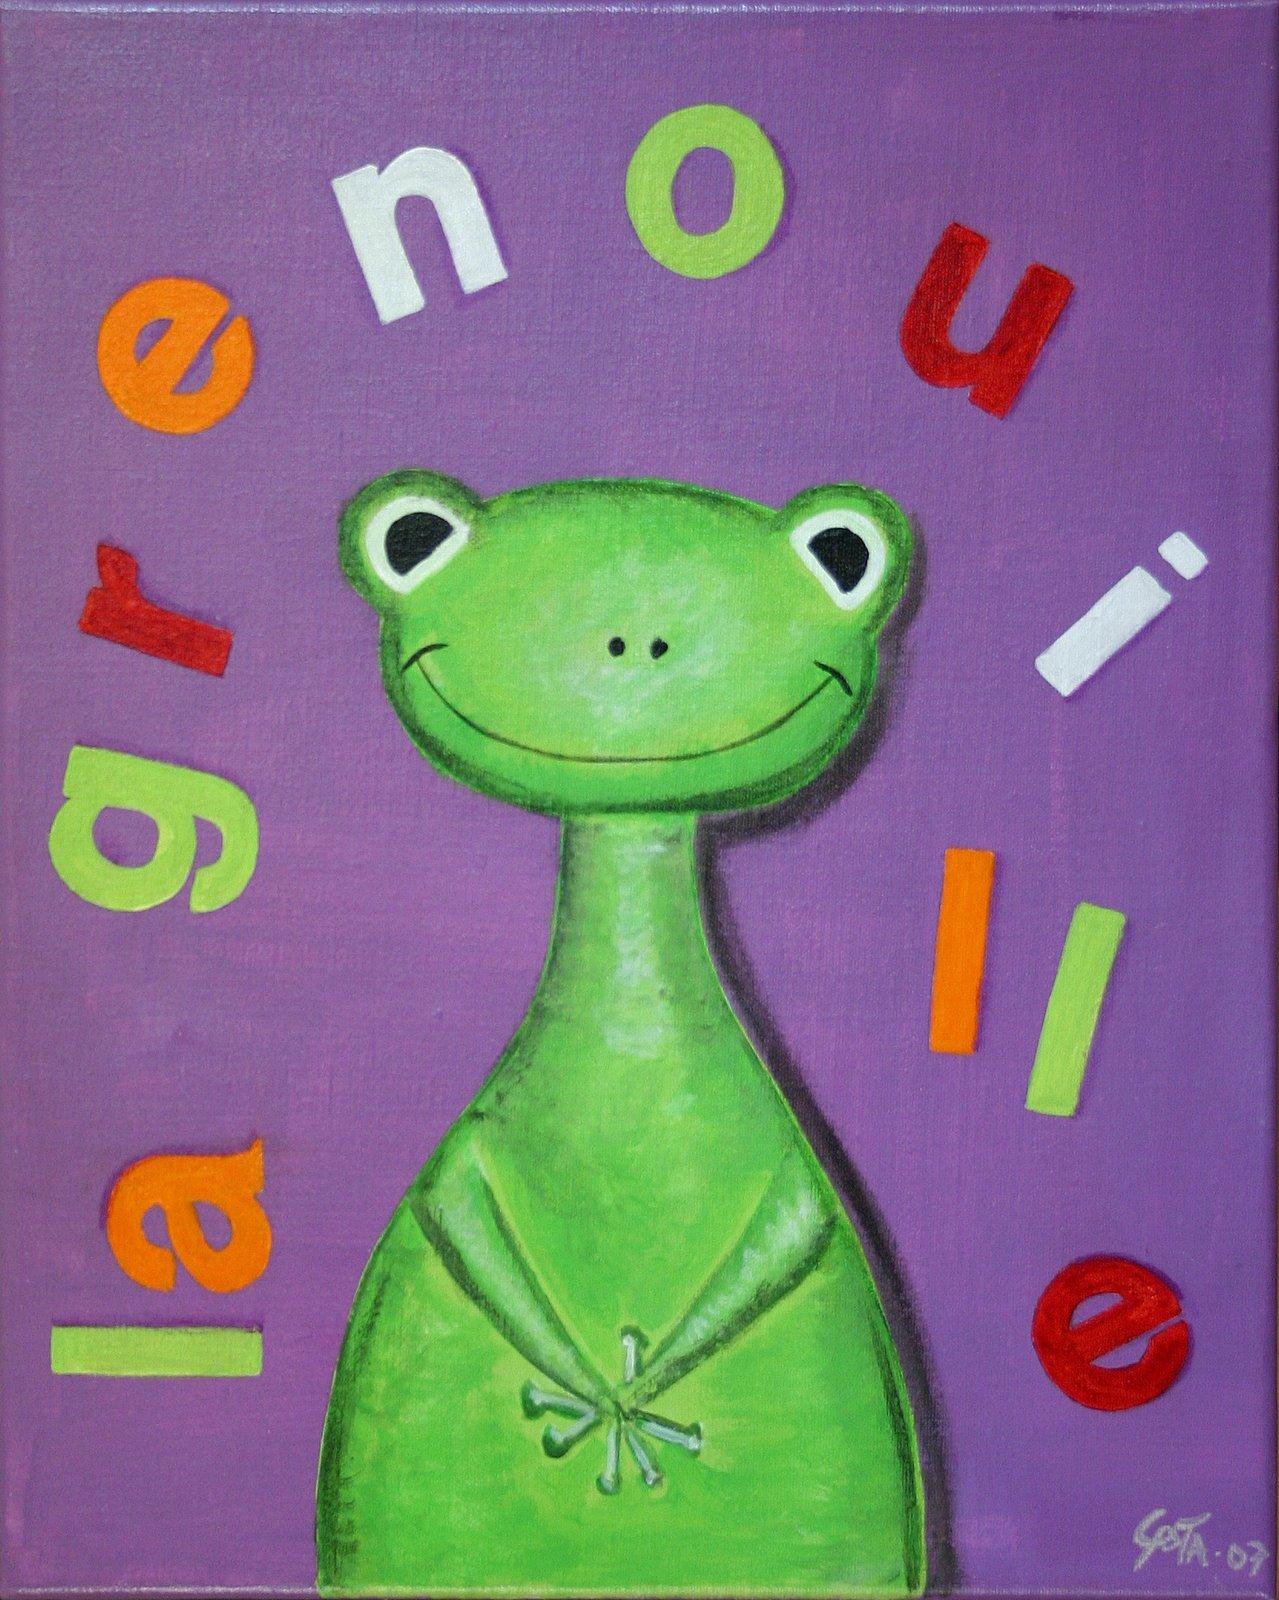 Tableau Contemporain, La grenouille. Sophie Costa, artiste peintre.